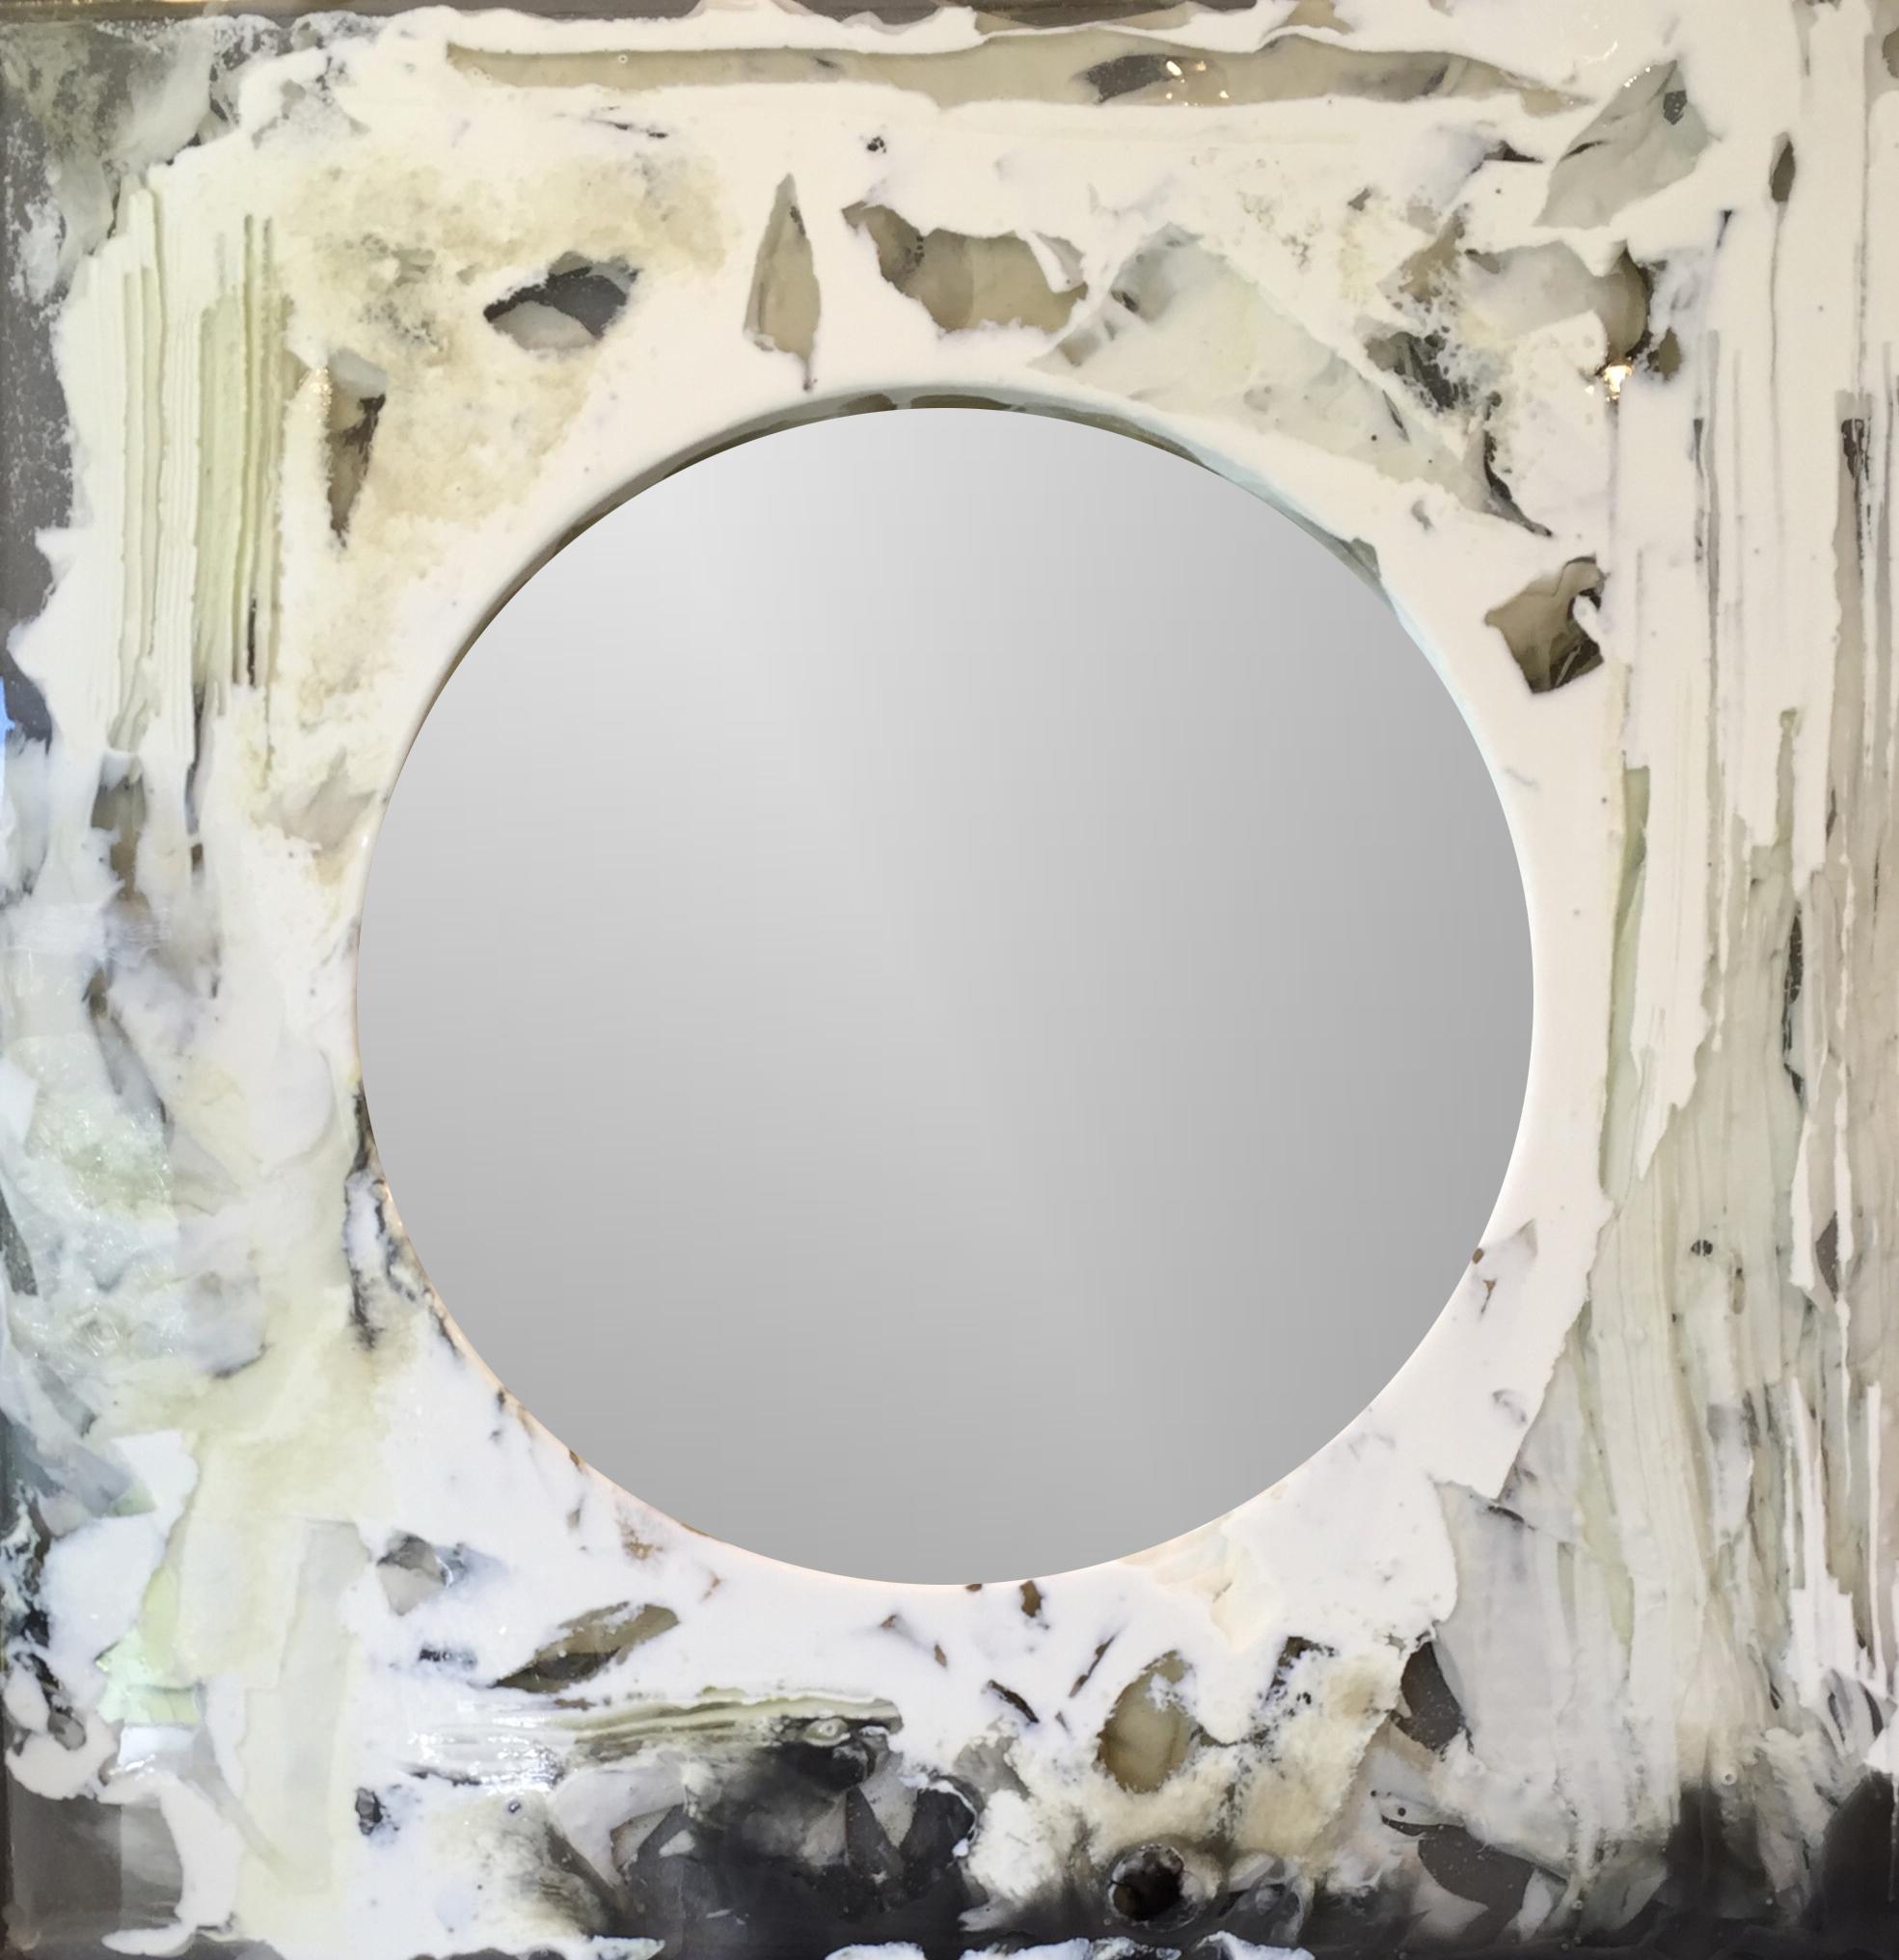 cuell.mirrorVIII